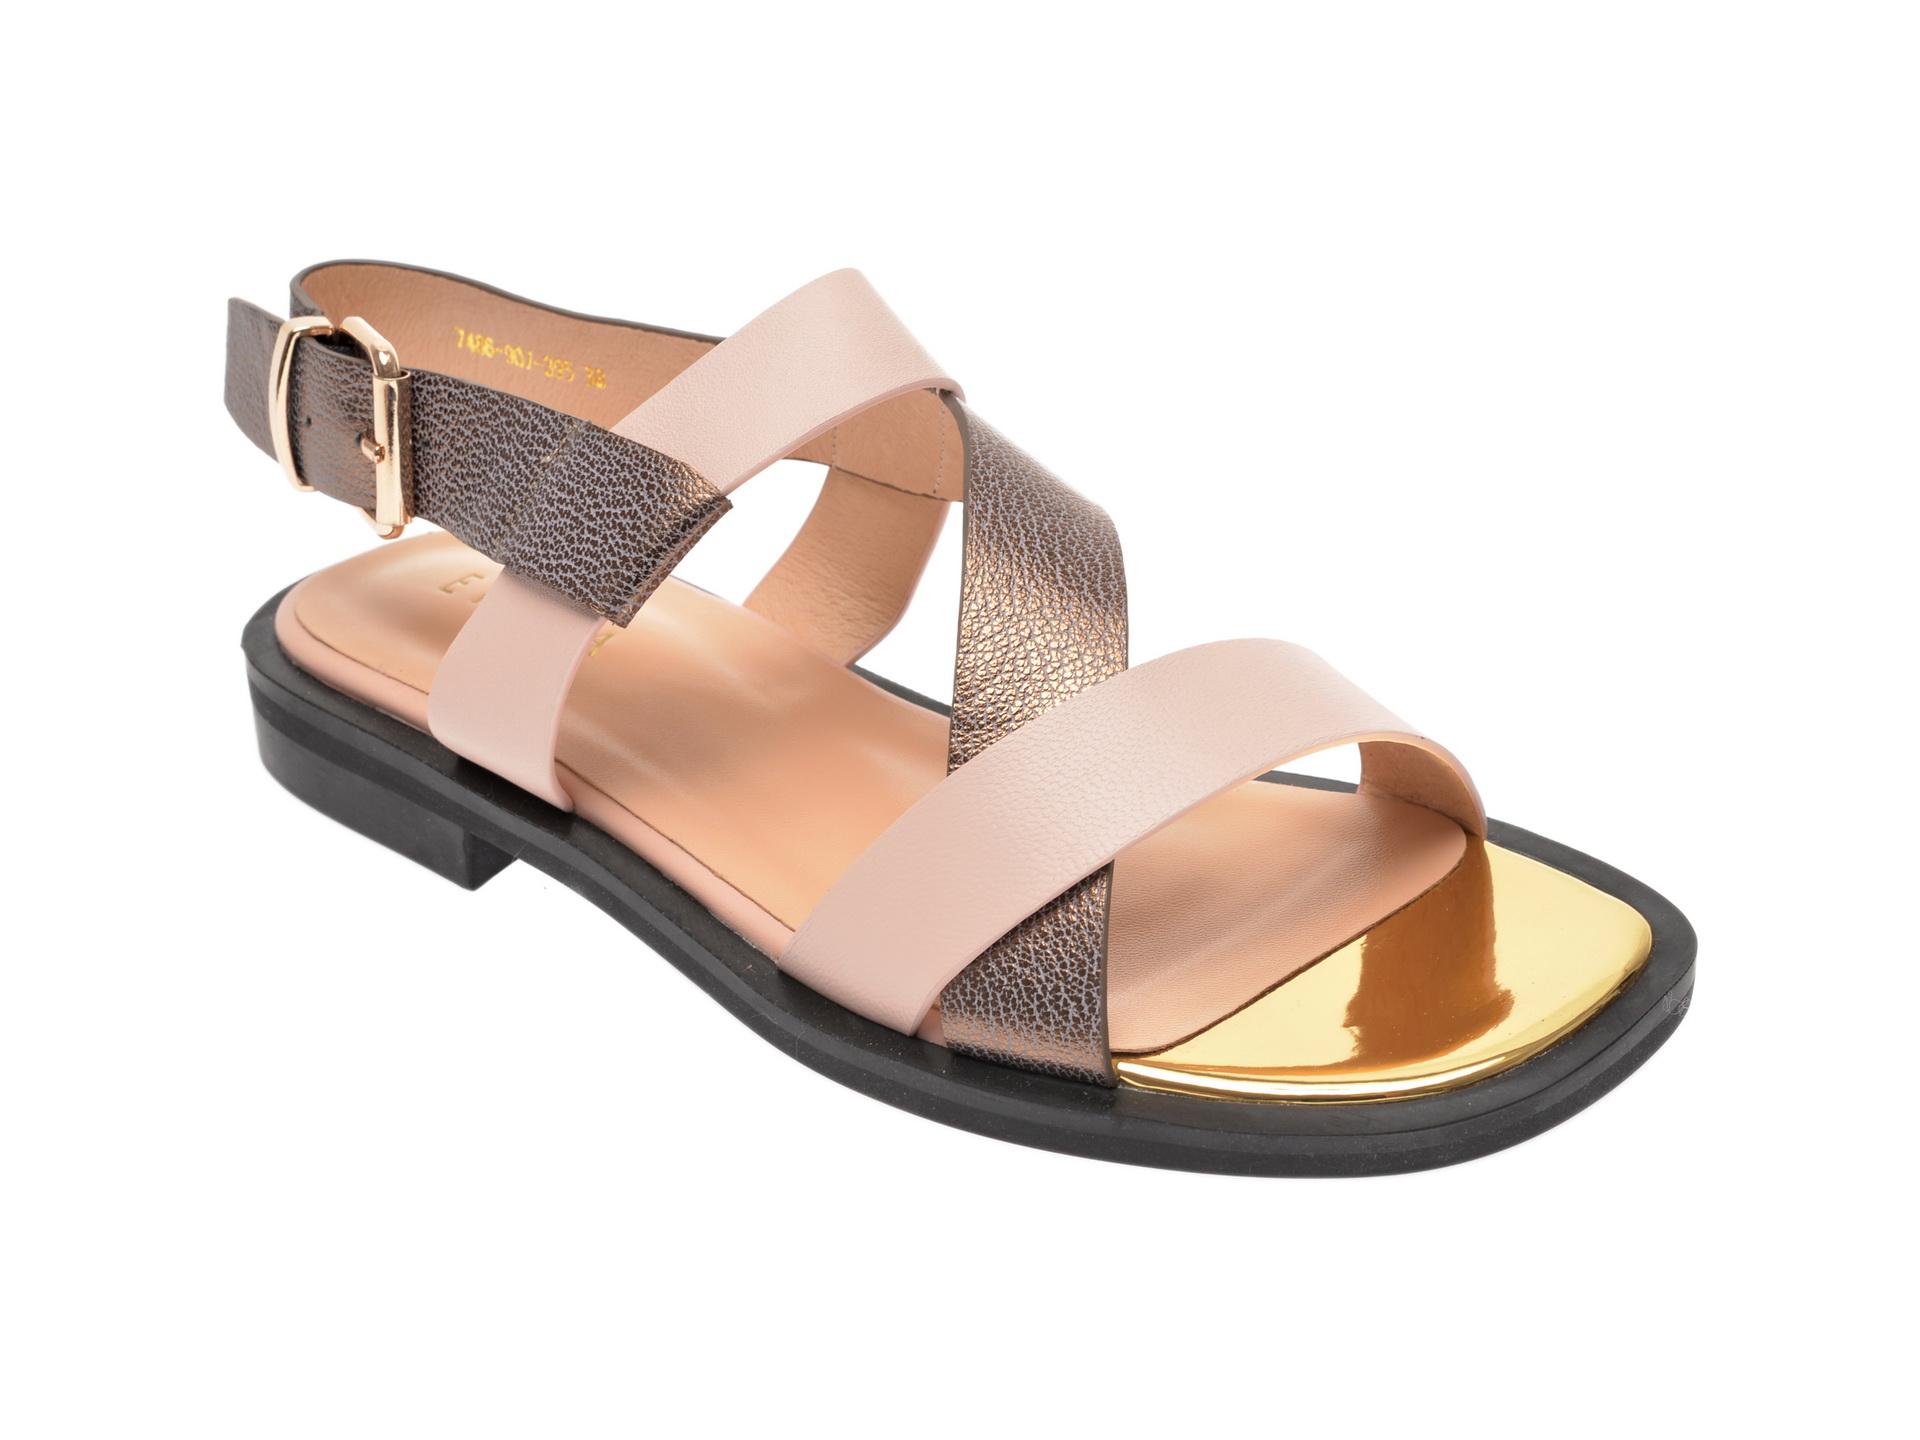 Sandale EPICA bej, 7486907, din piele naturala